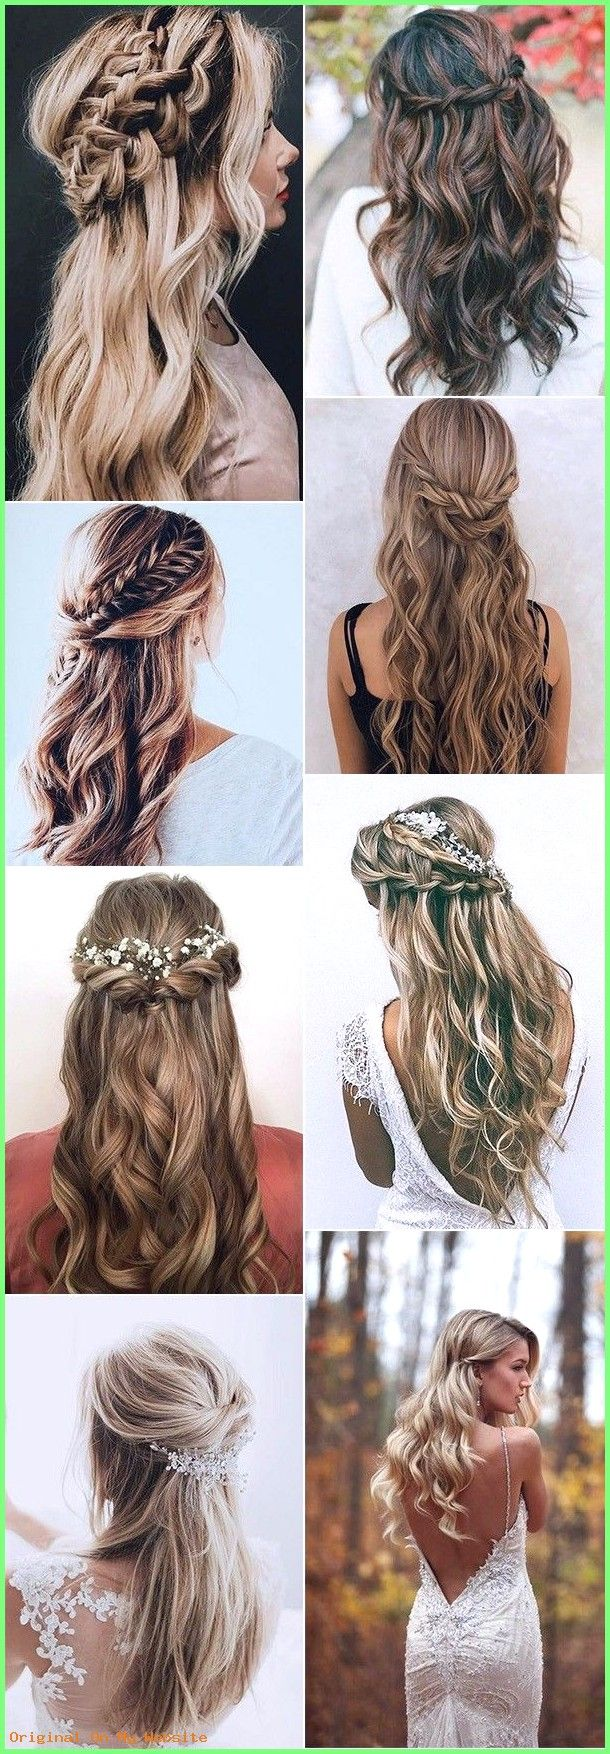 Prom Frisuren 2019 – trending half up half down wedding hairstyles #weddinghairstyles #bridal…